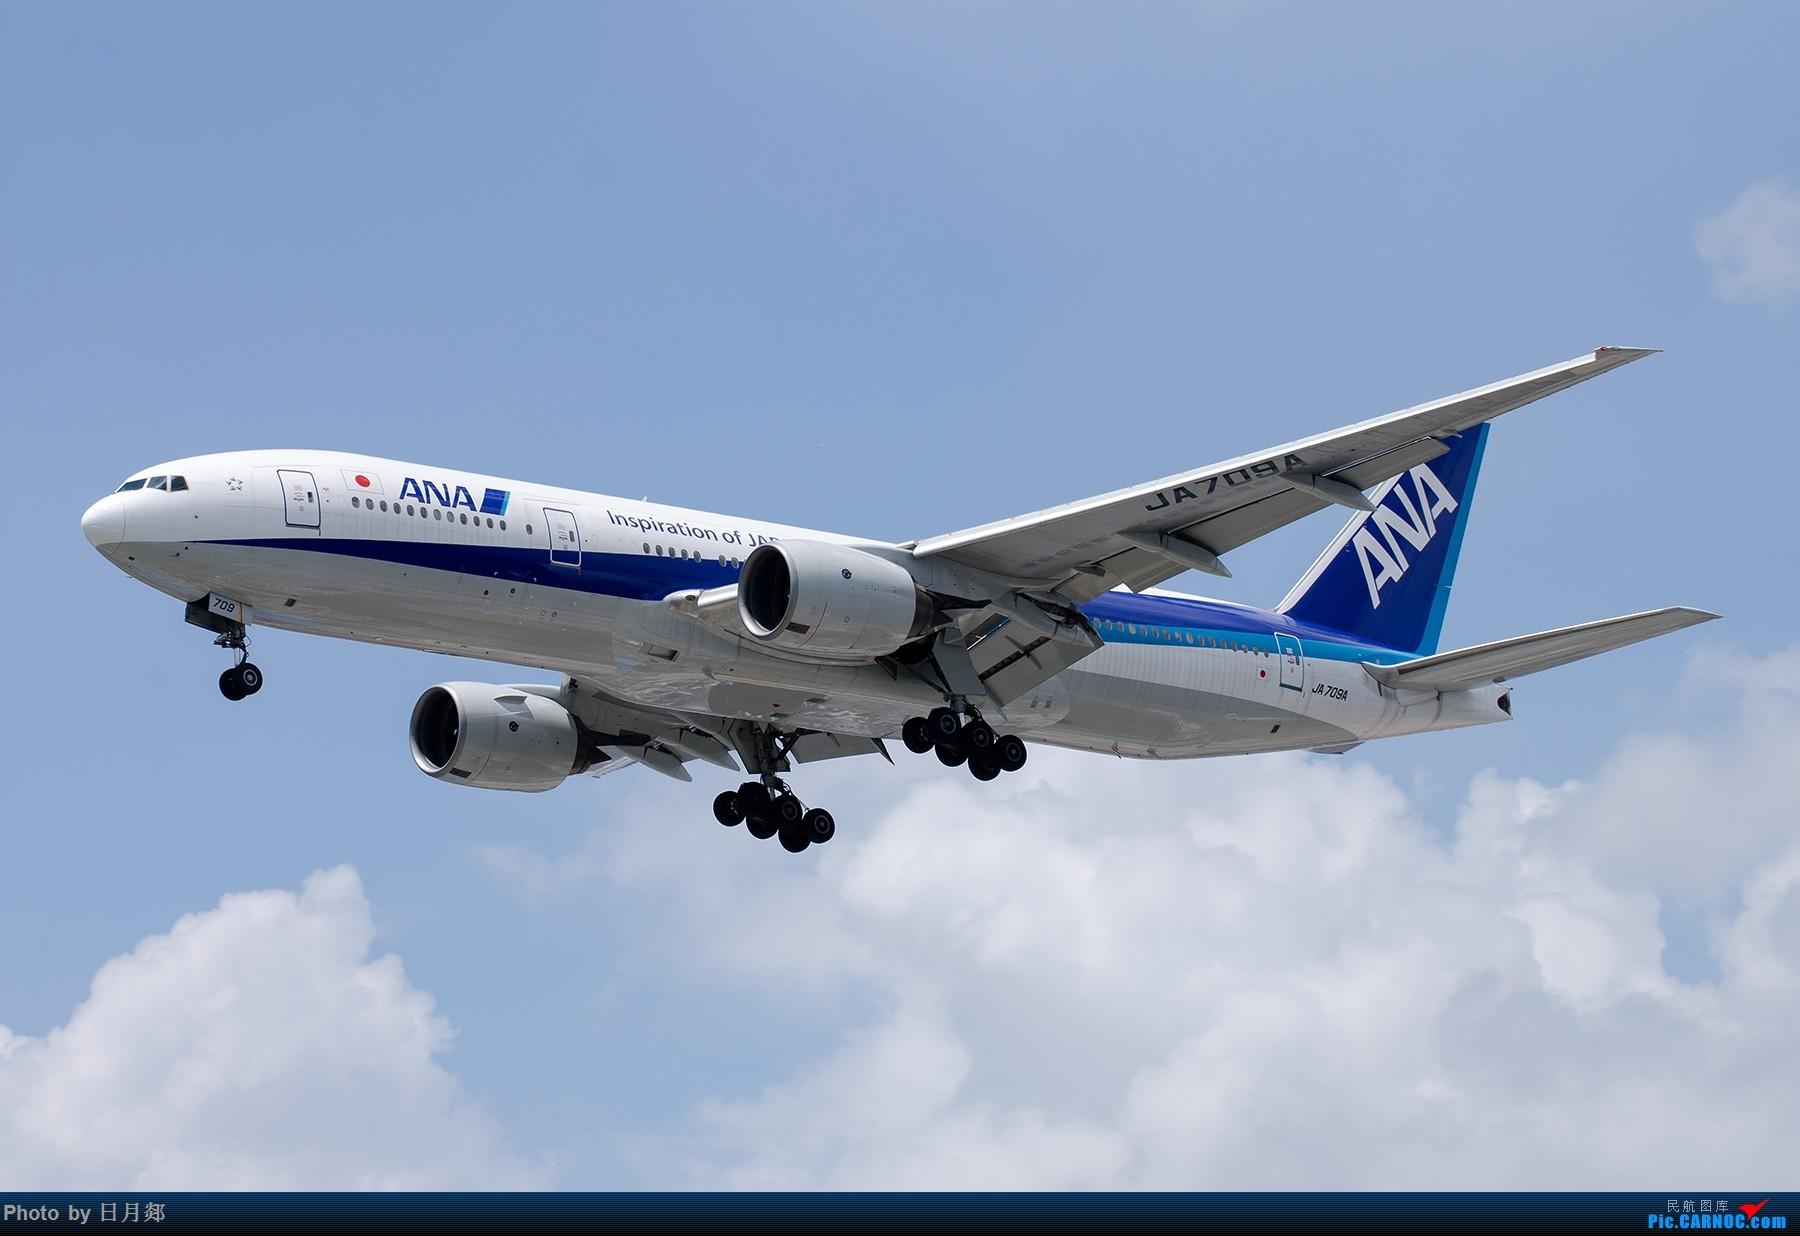 Re:[原创]【SHA拍机*1800大图】图要抓紧发,不然就要炒冷饭,大头镇贴 BOEING 777-200  中国上海虹桥国际机场